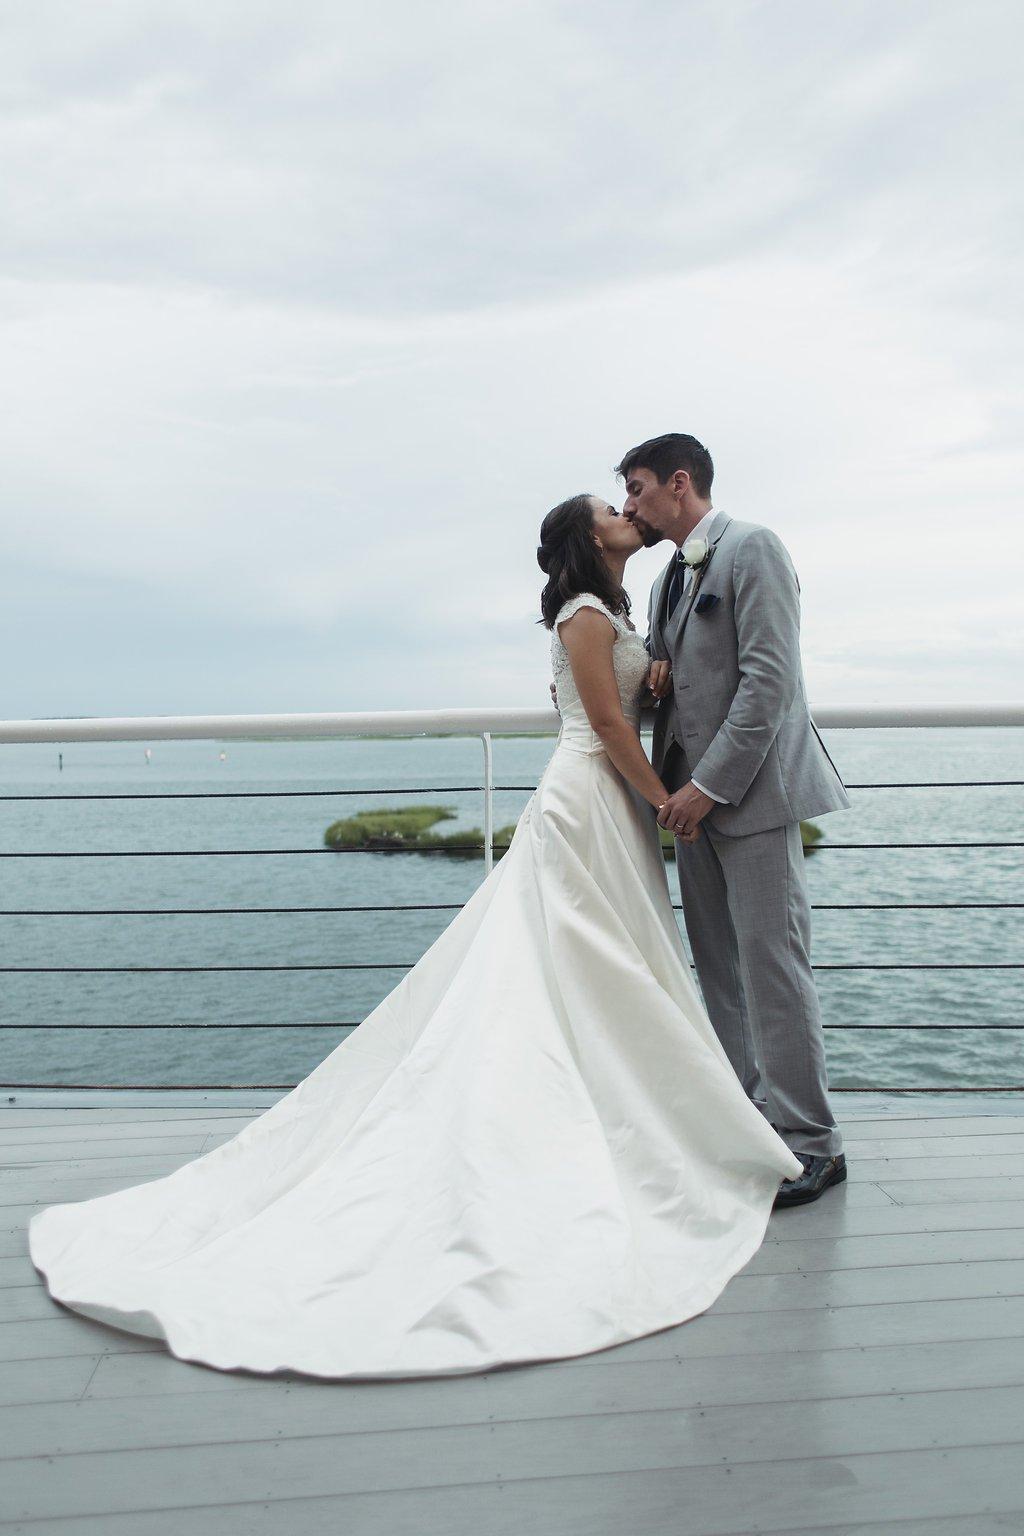 rainy-wedding-day-myth-best-wedding-photos-lesner-inn-virginia-beach-Sunset-Deck